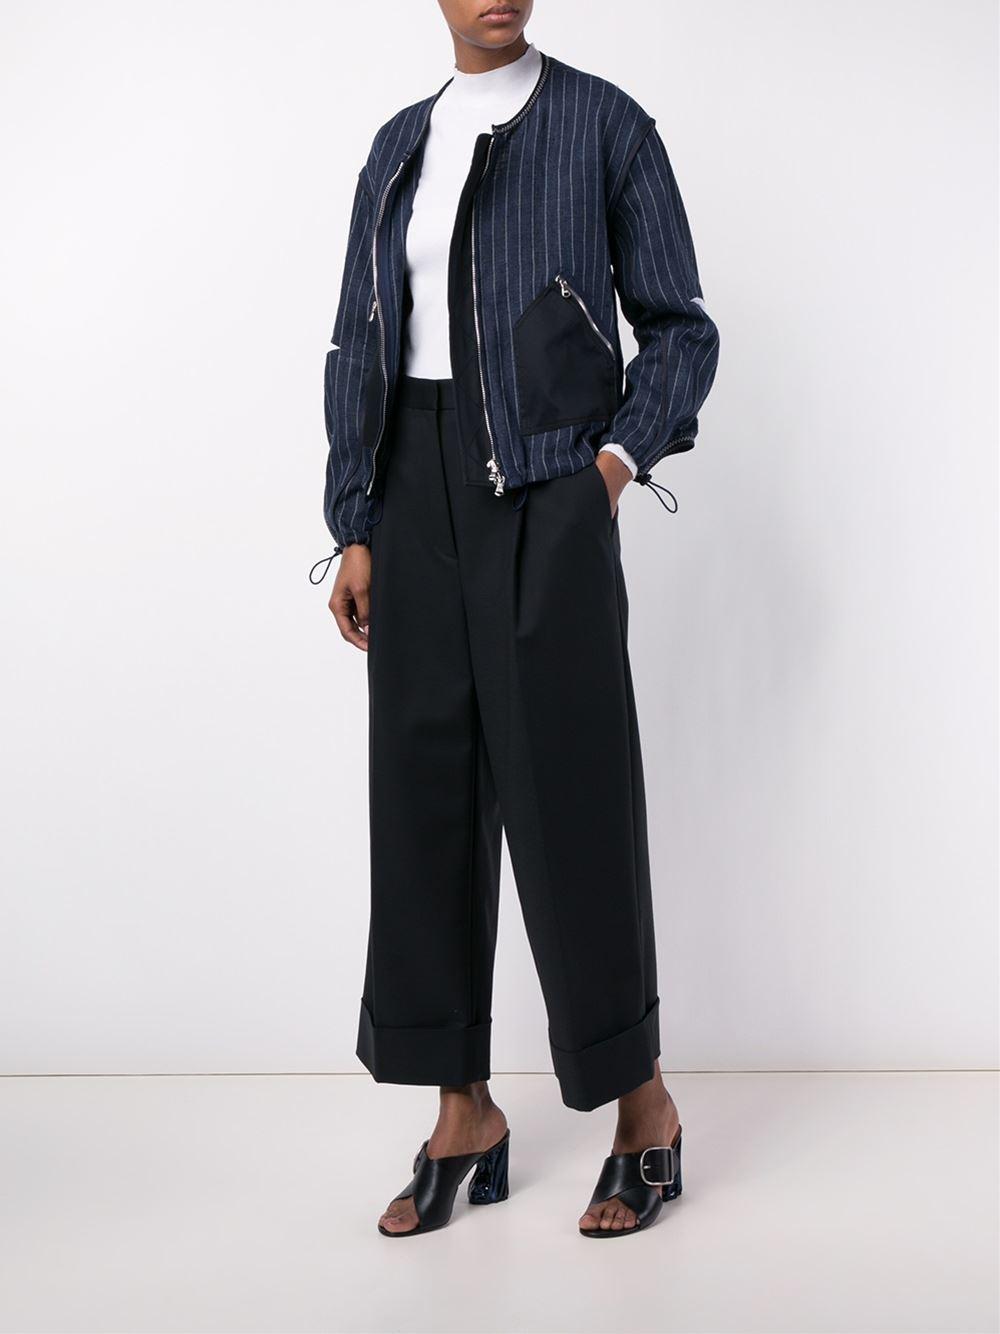 3.1 Phillip Lim pinstripe bomber jacket